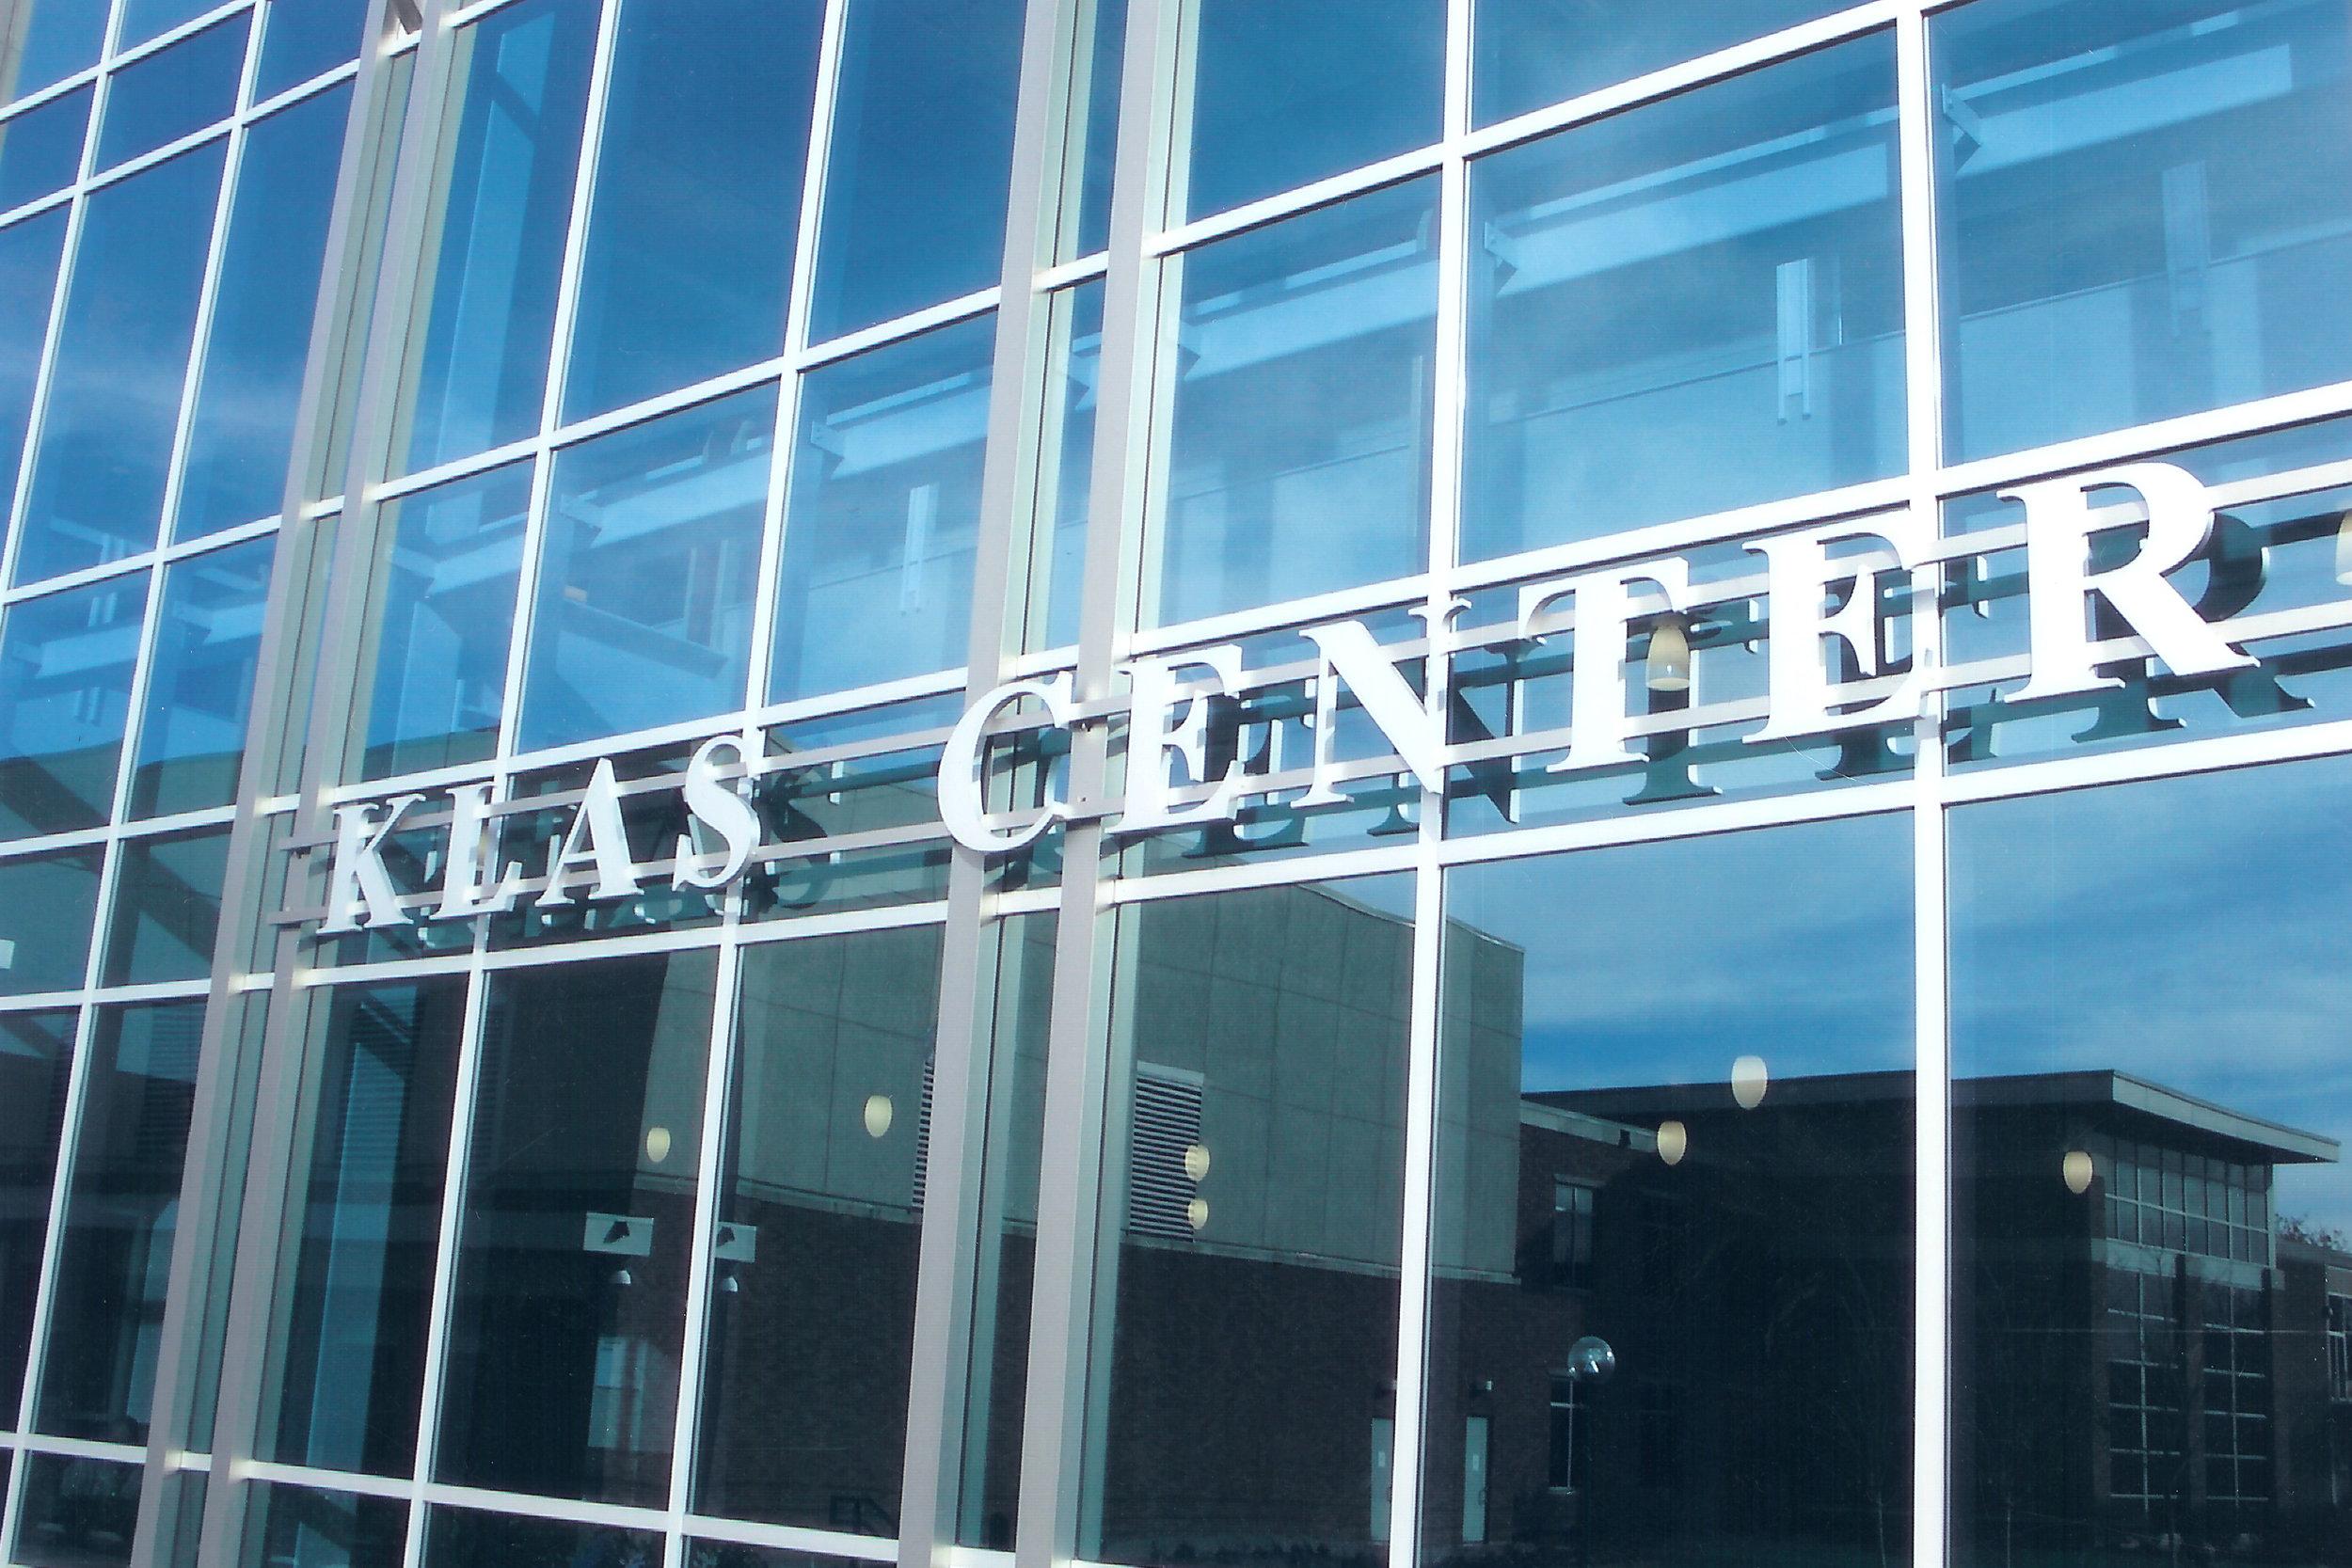 Hamline University Klas Center